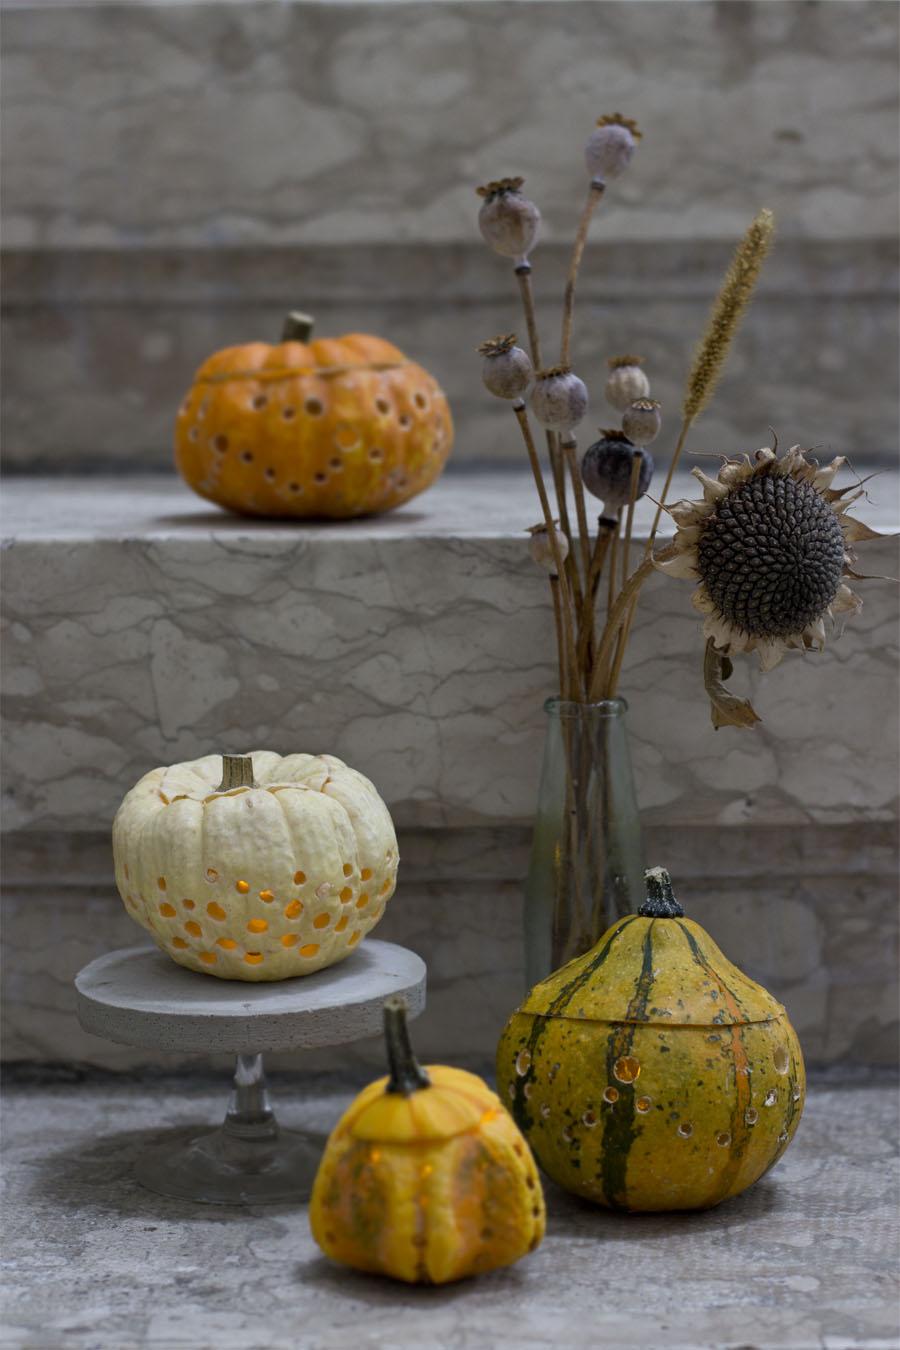 DIY pumpkin lantern | LOOK WHAT I MADE ...